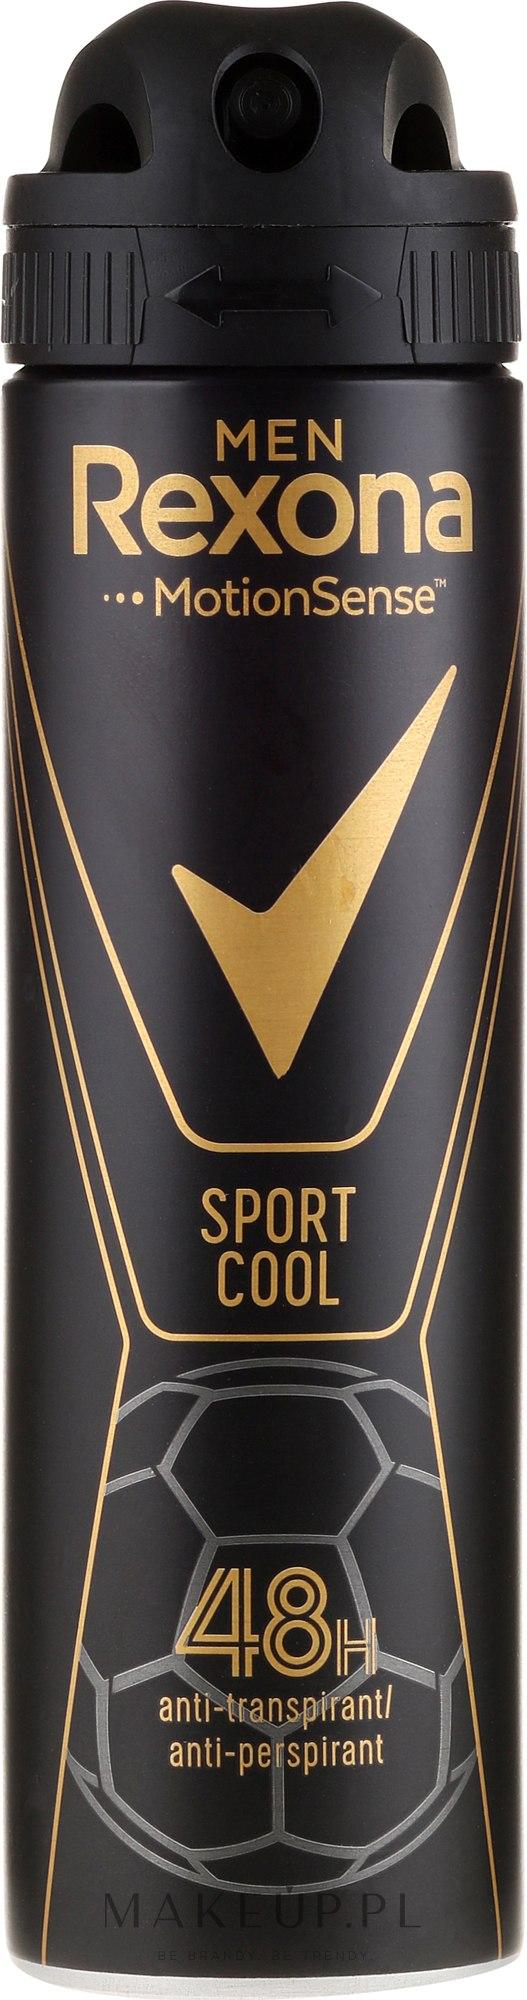 Antyperspirant w sprayu dla mężczyzn - Rexona Men MotionSense Sport Cool Anti-perspirant — фото 150 ml